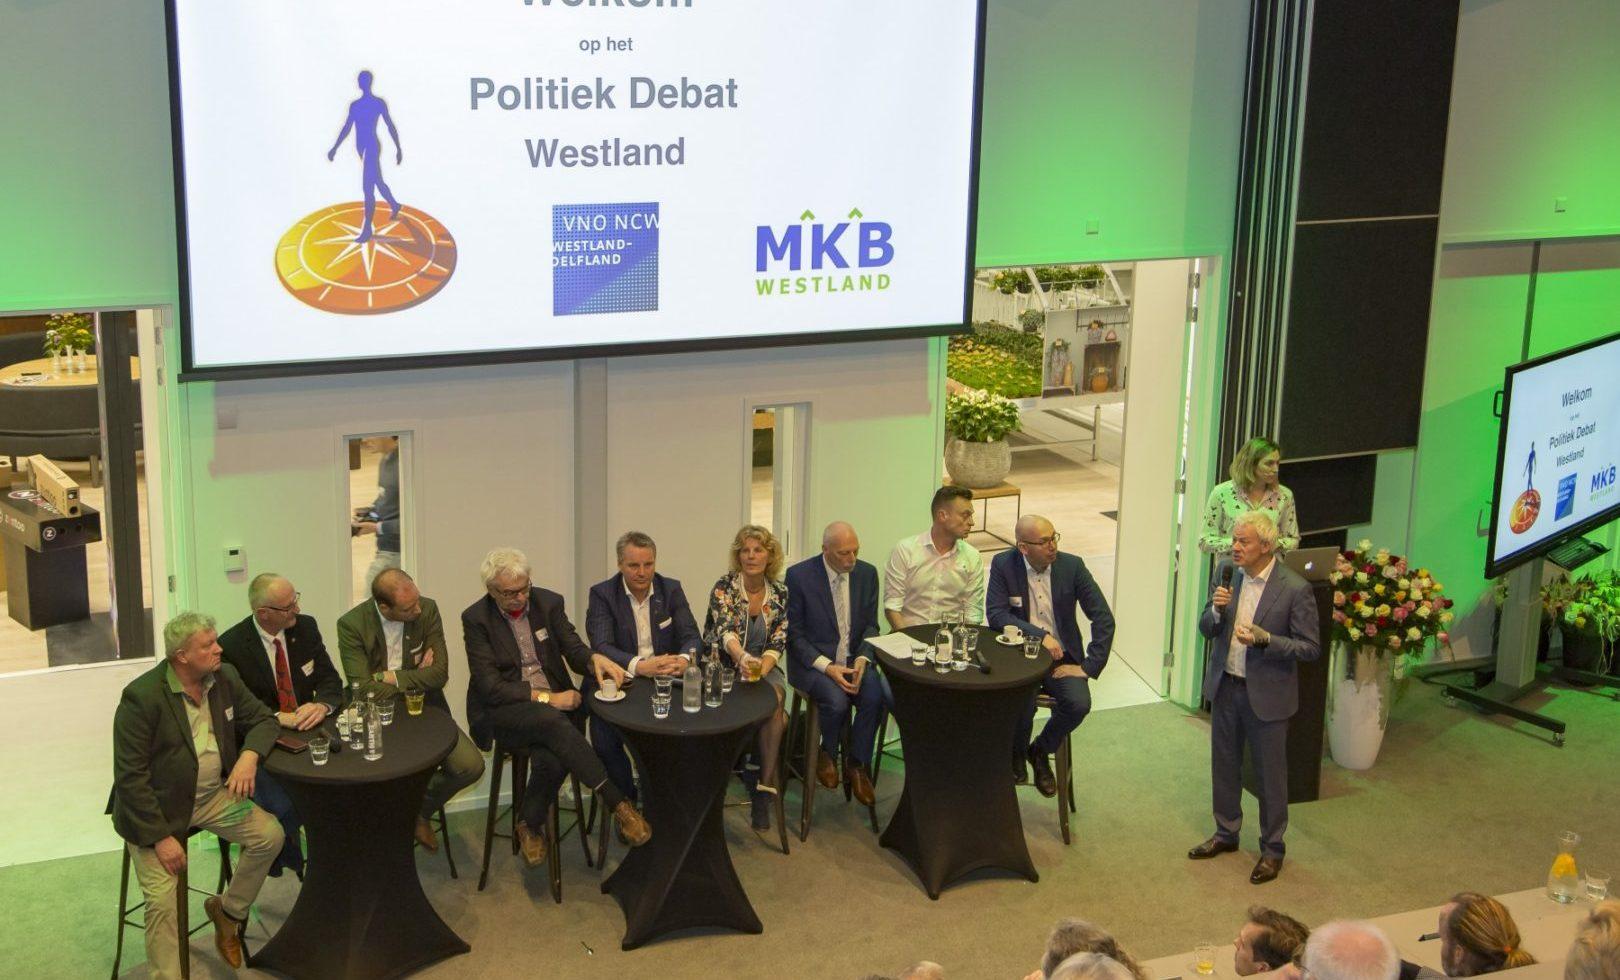 Politiek Debat 2018